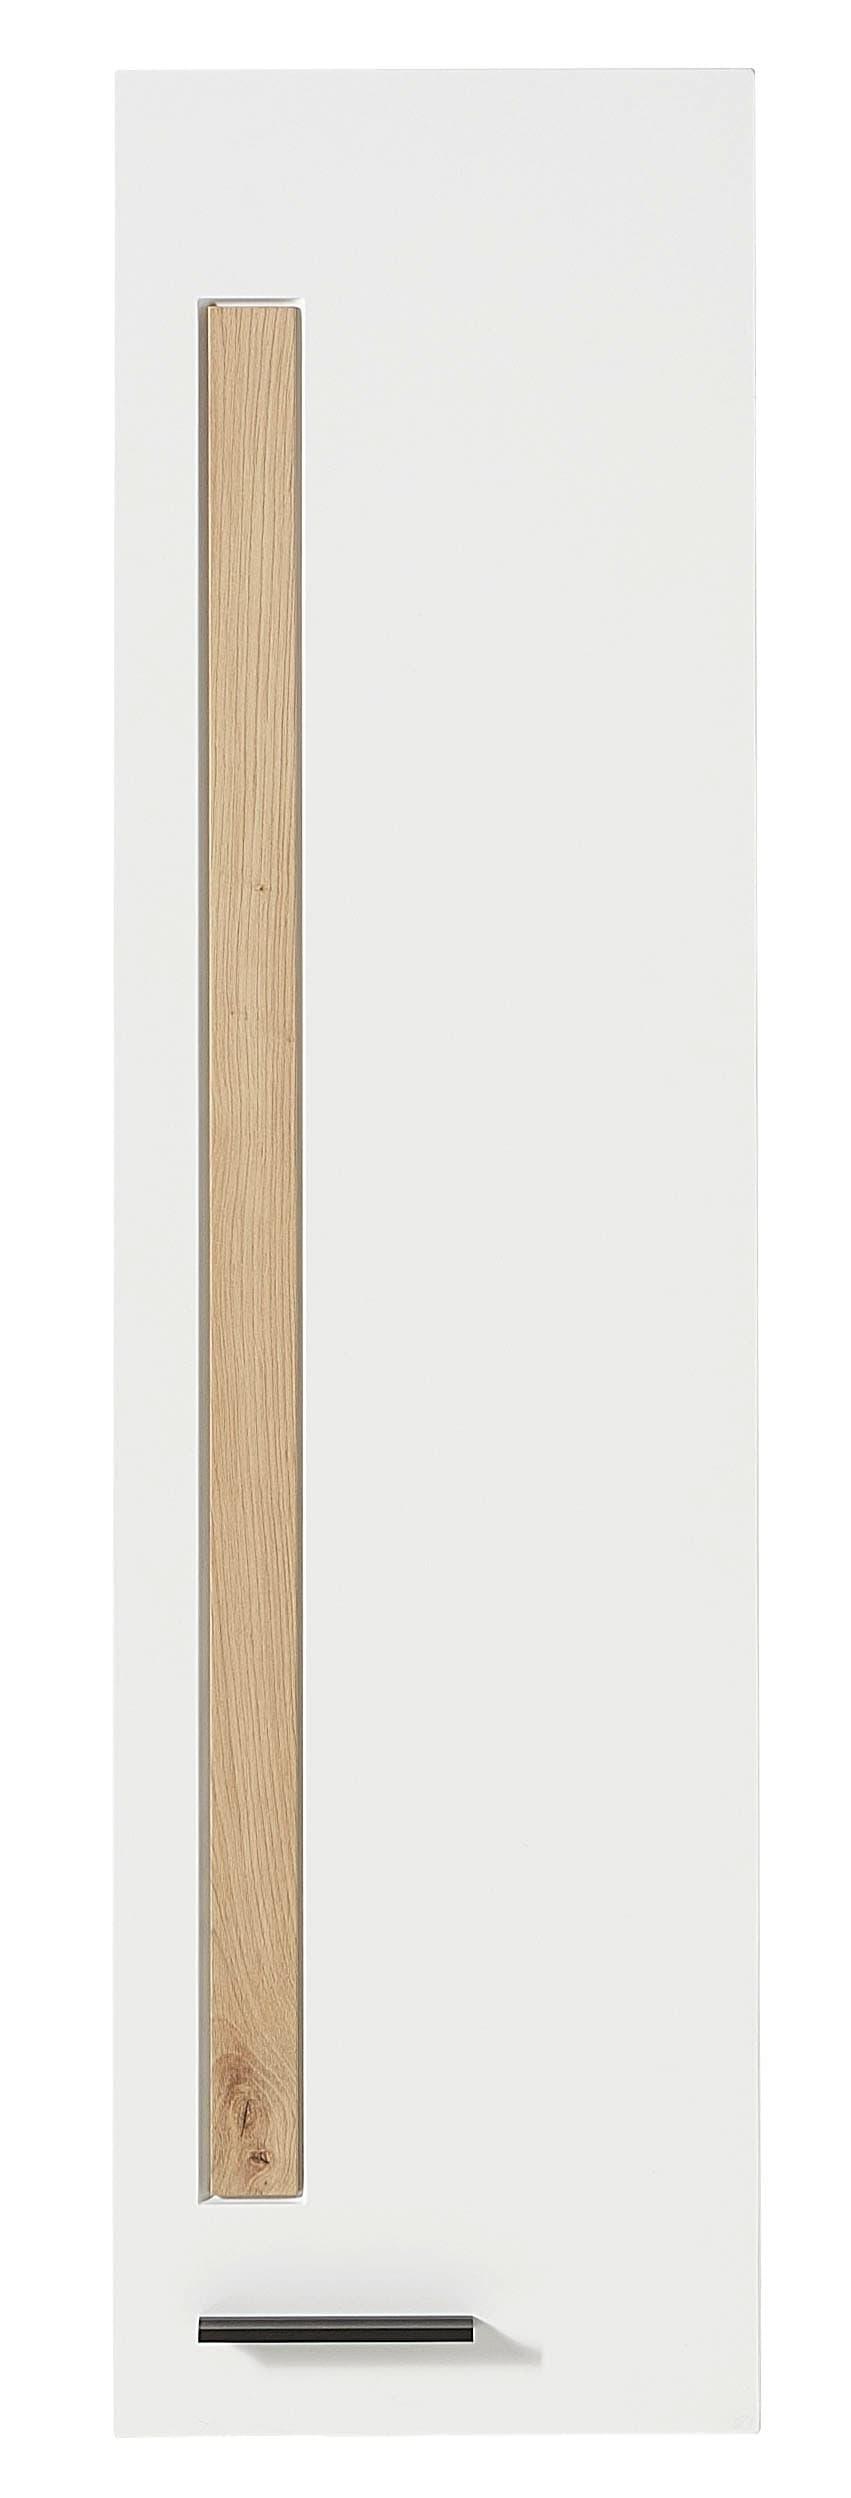 Cabinet suspendat din MDF cu 1 usa Loftis Alb / Stejar, l36xA37xH128 cm imagine